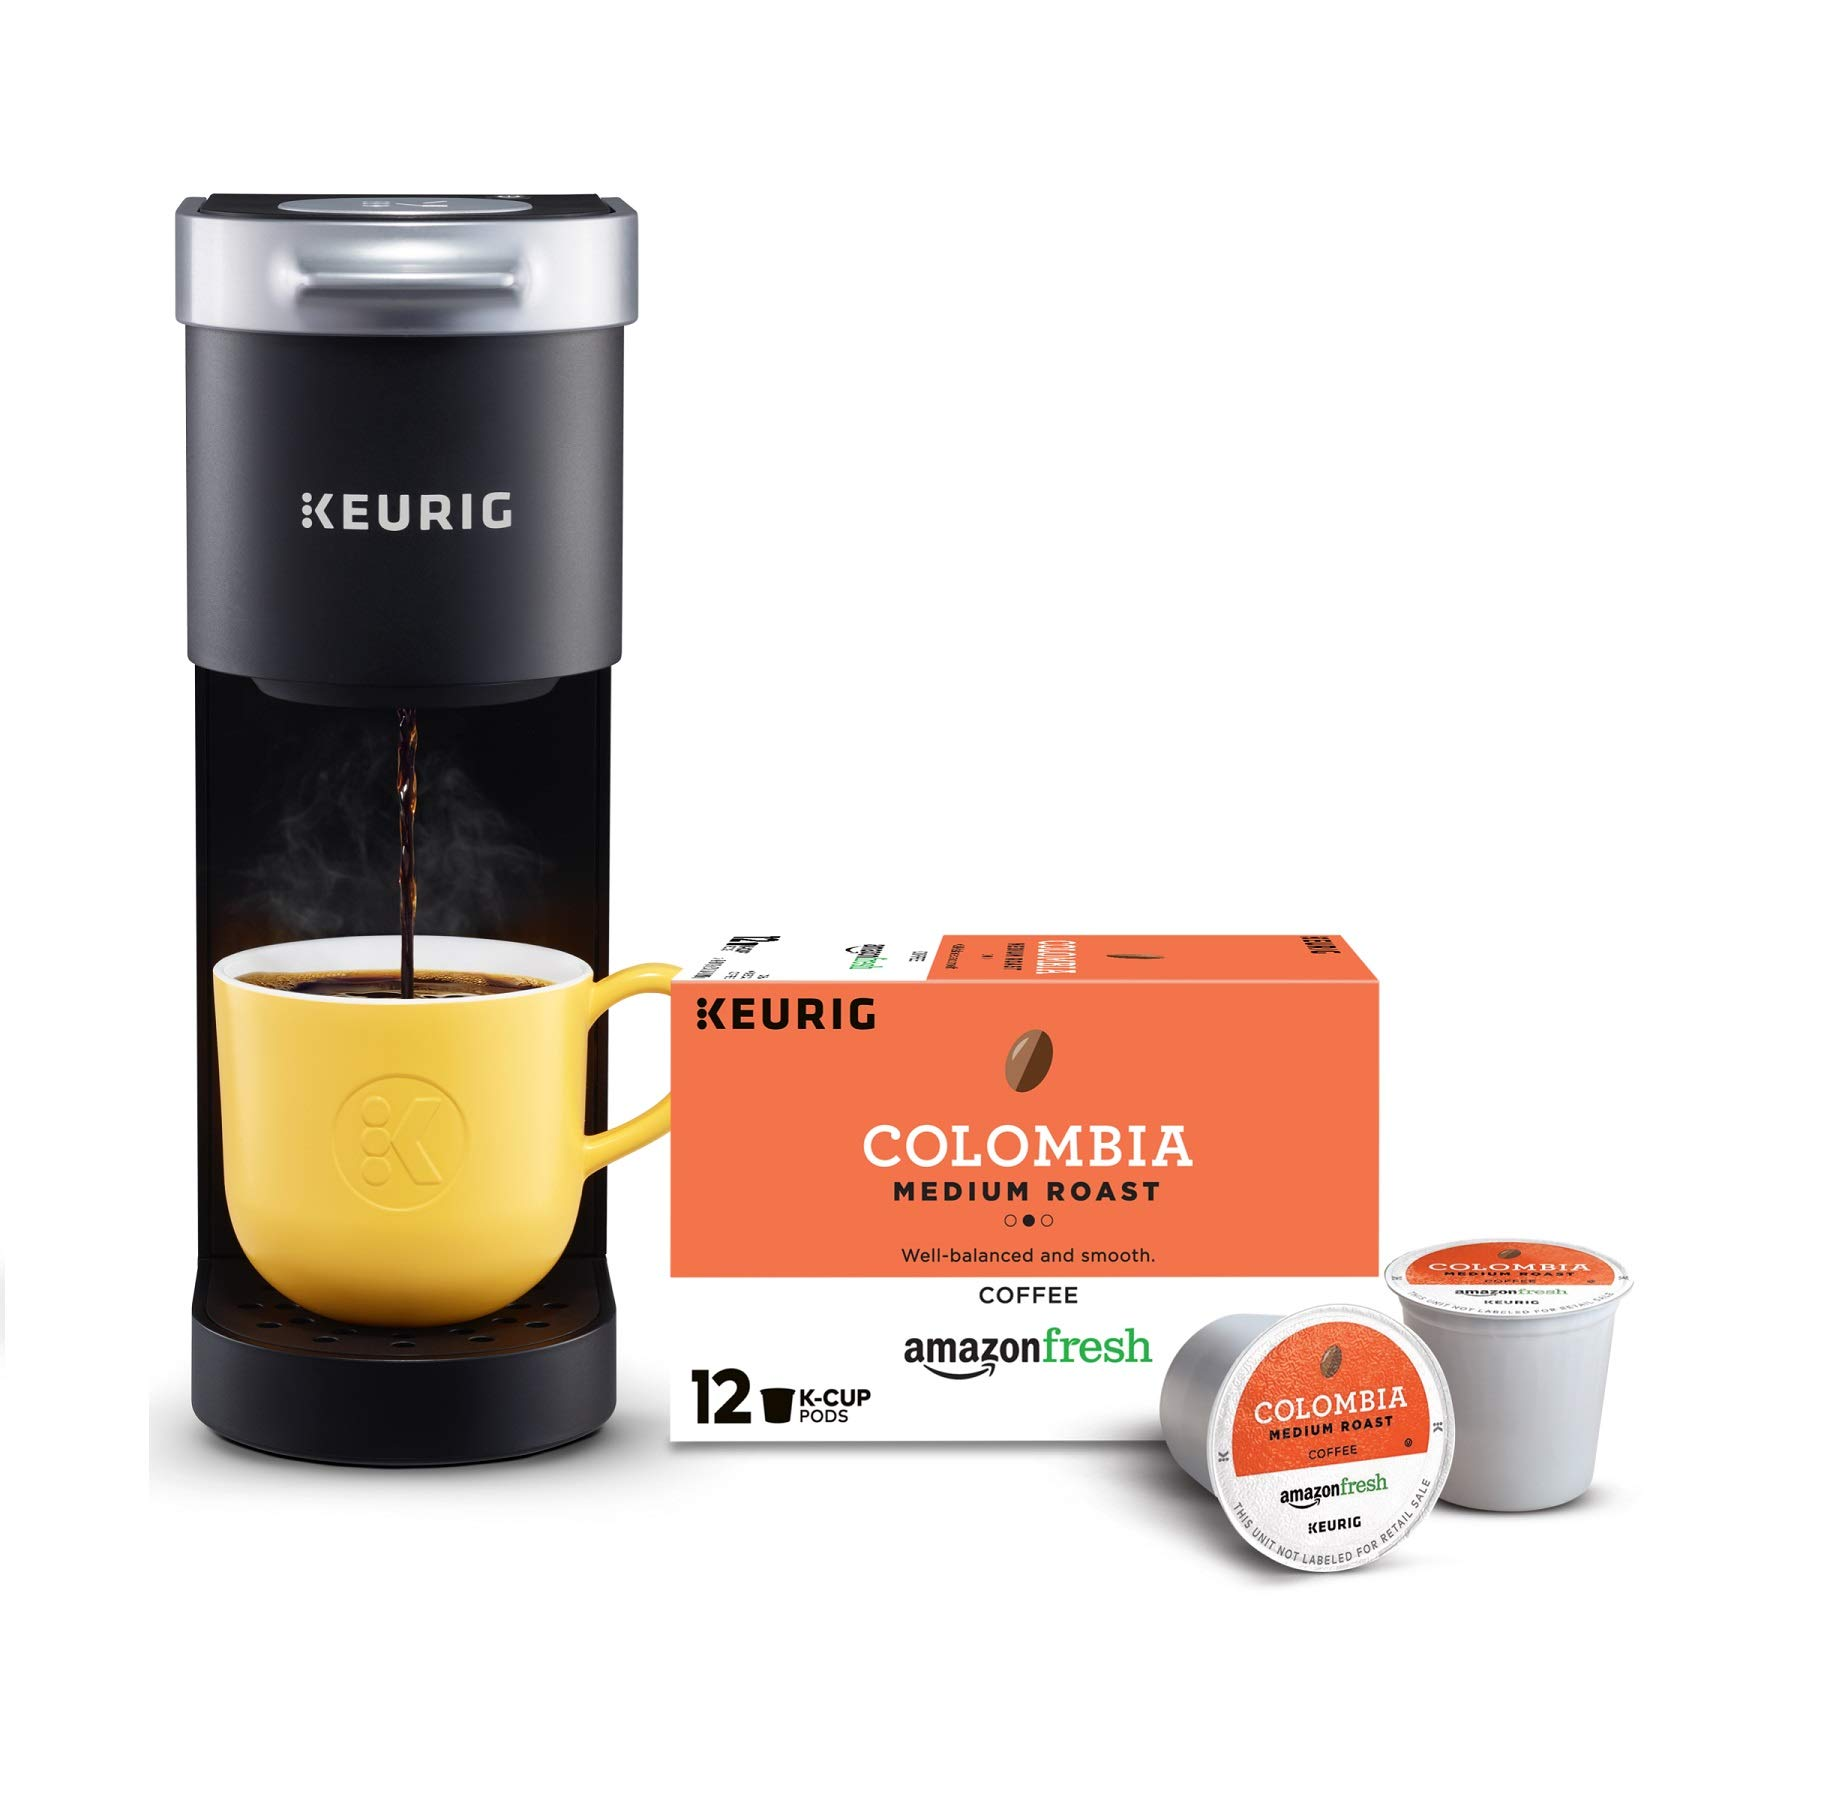 Keurig K-Mini Single Serve Coffee Maker with AmazonFresh 12 Ct. Colombia Medium Roast K-Cup Coffee Pods, 6 to 12 oz Brew Size by Keurig